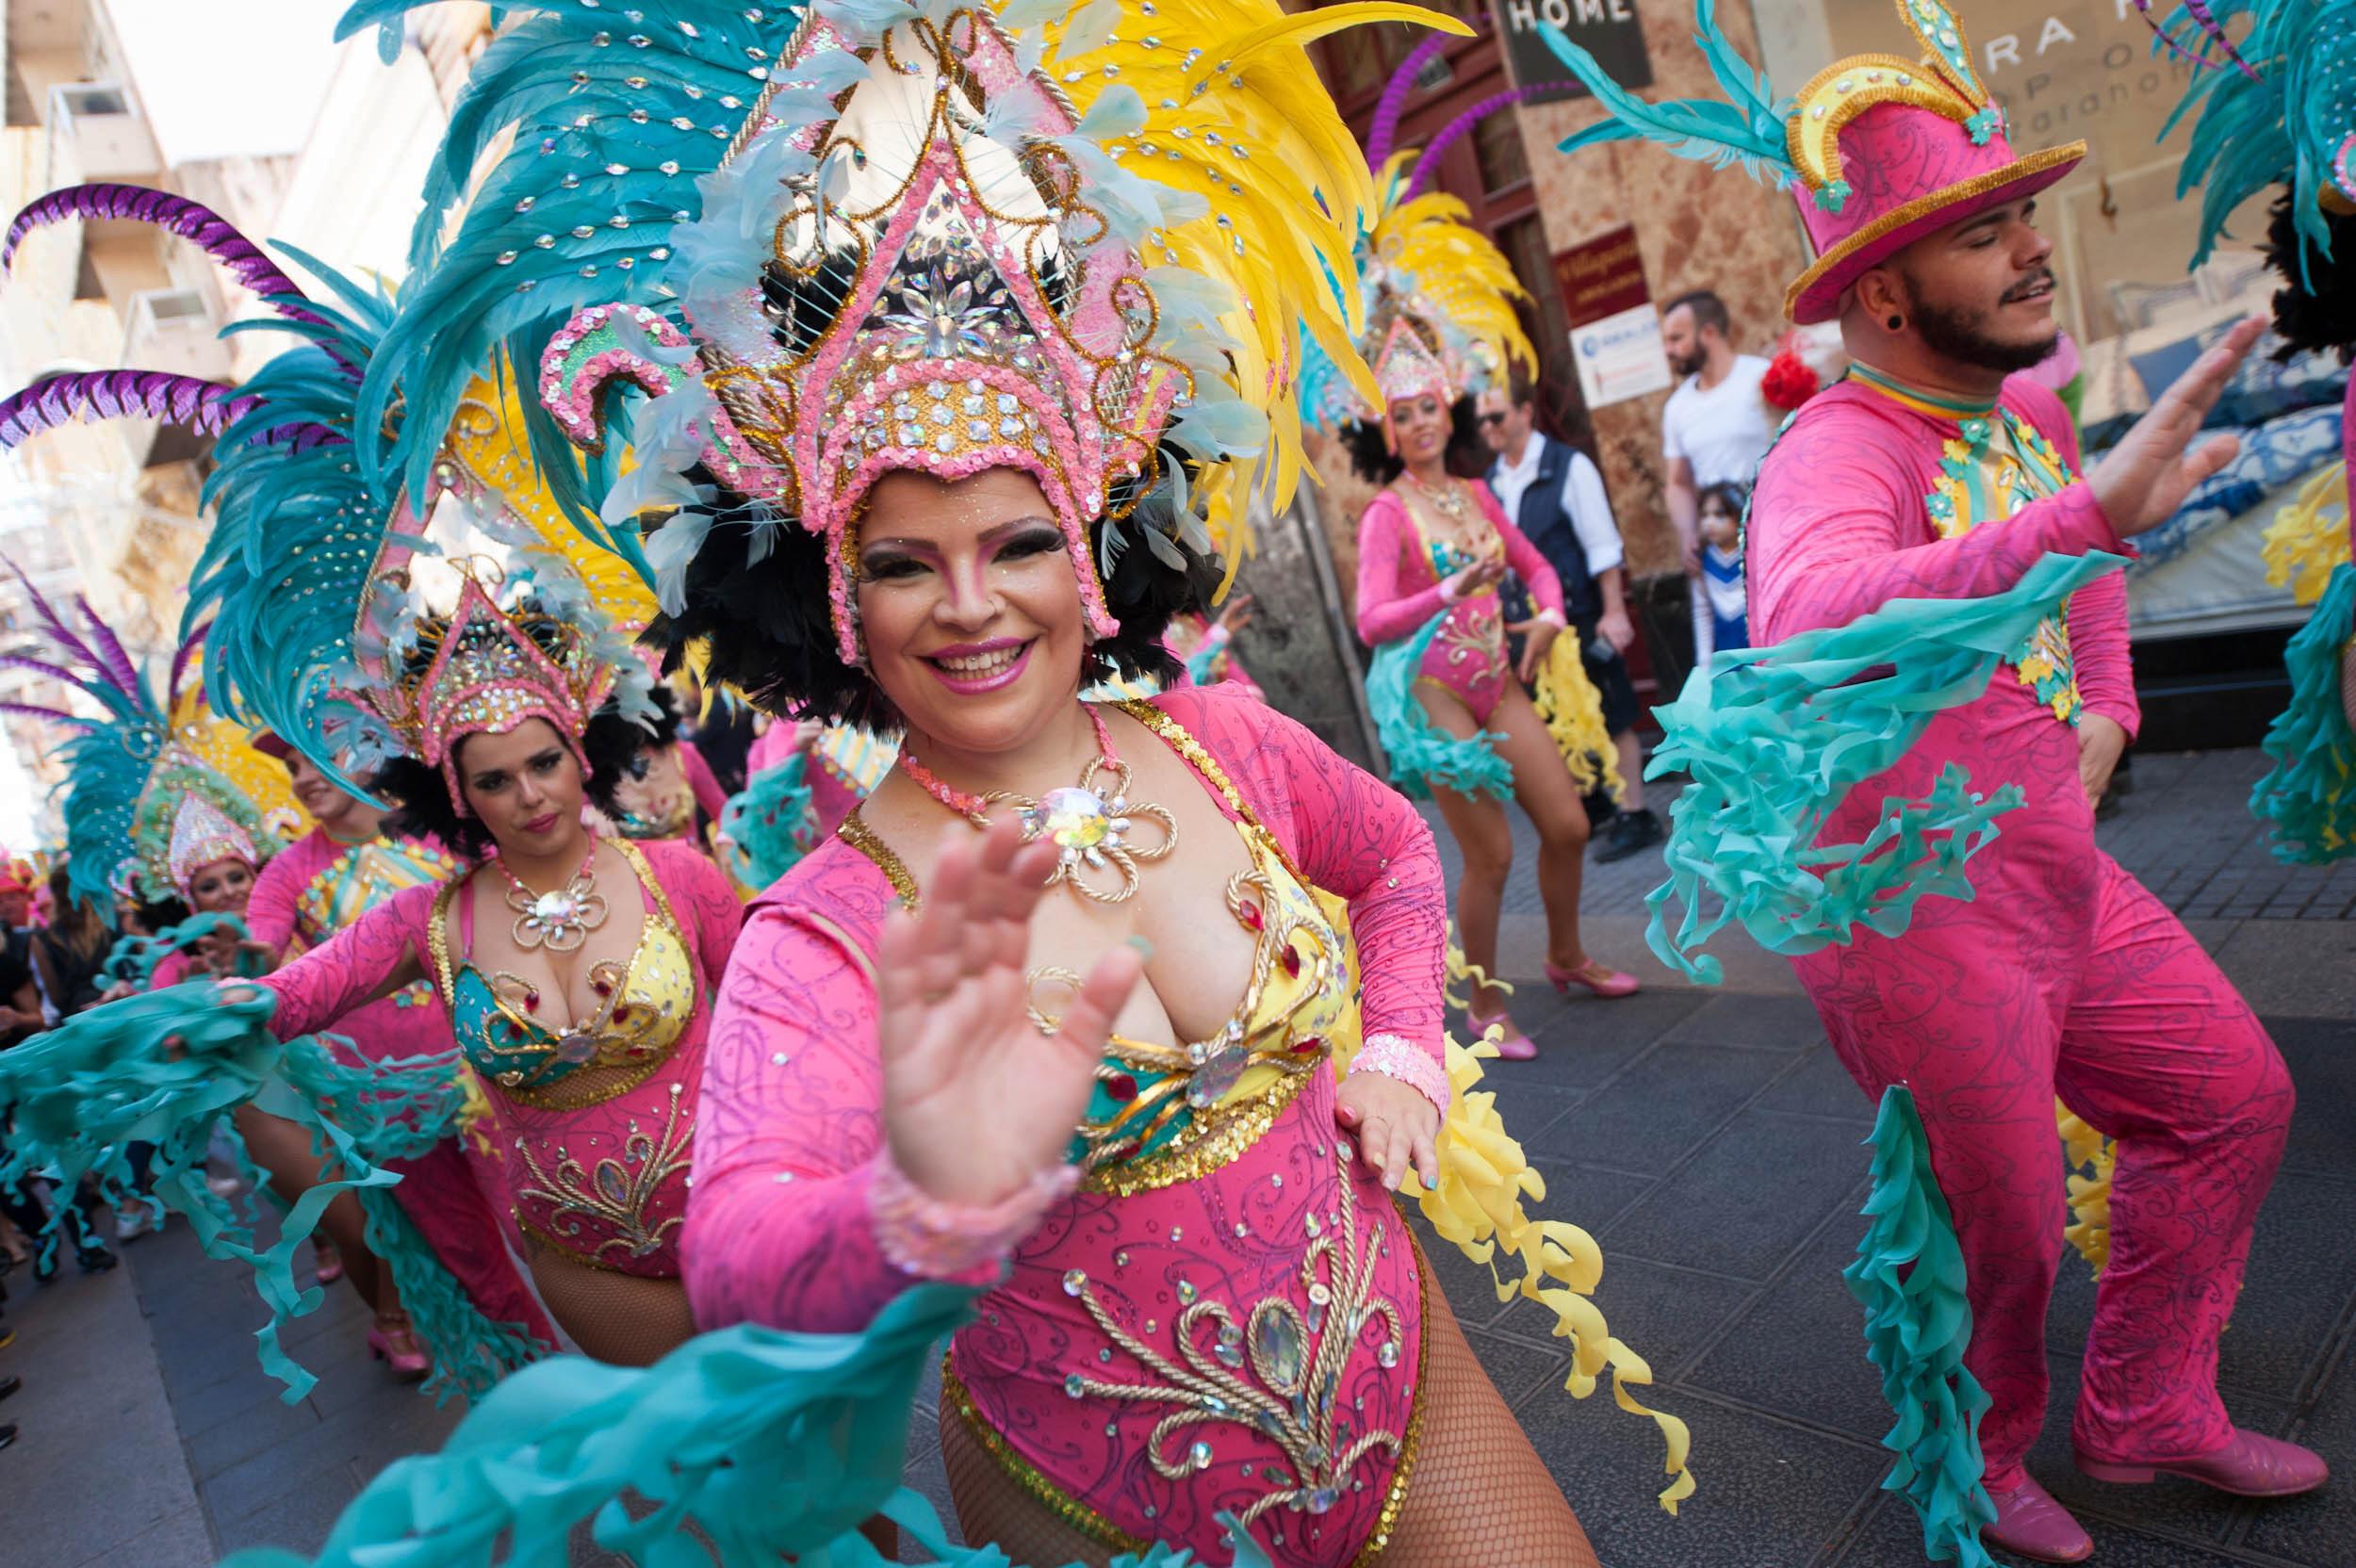 fp carnaval de dia134.jpg